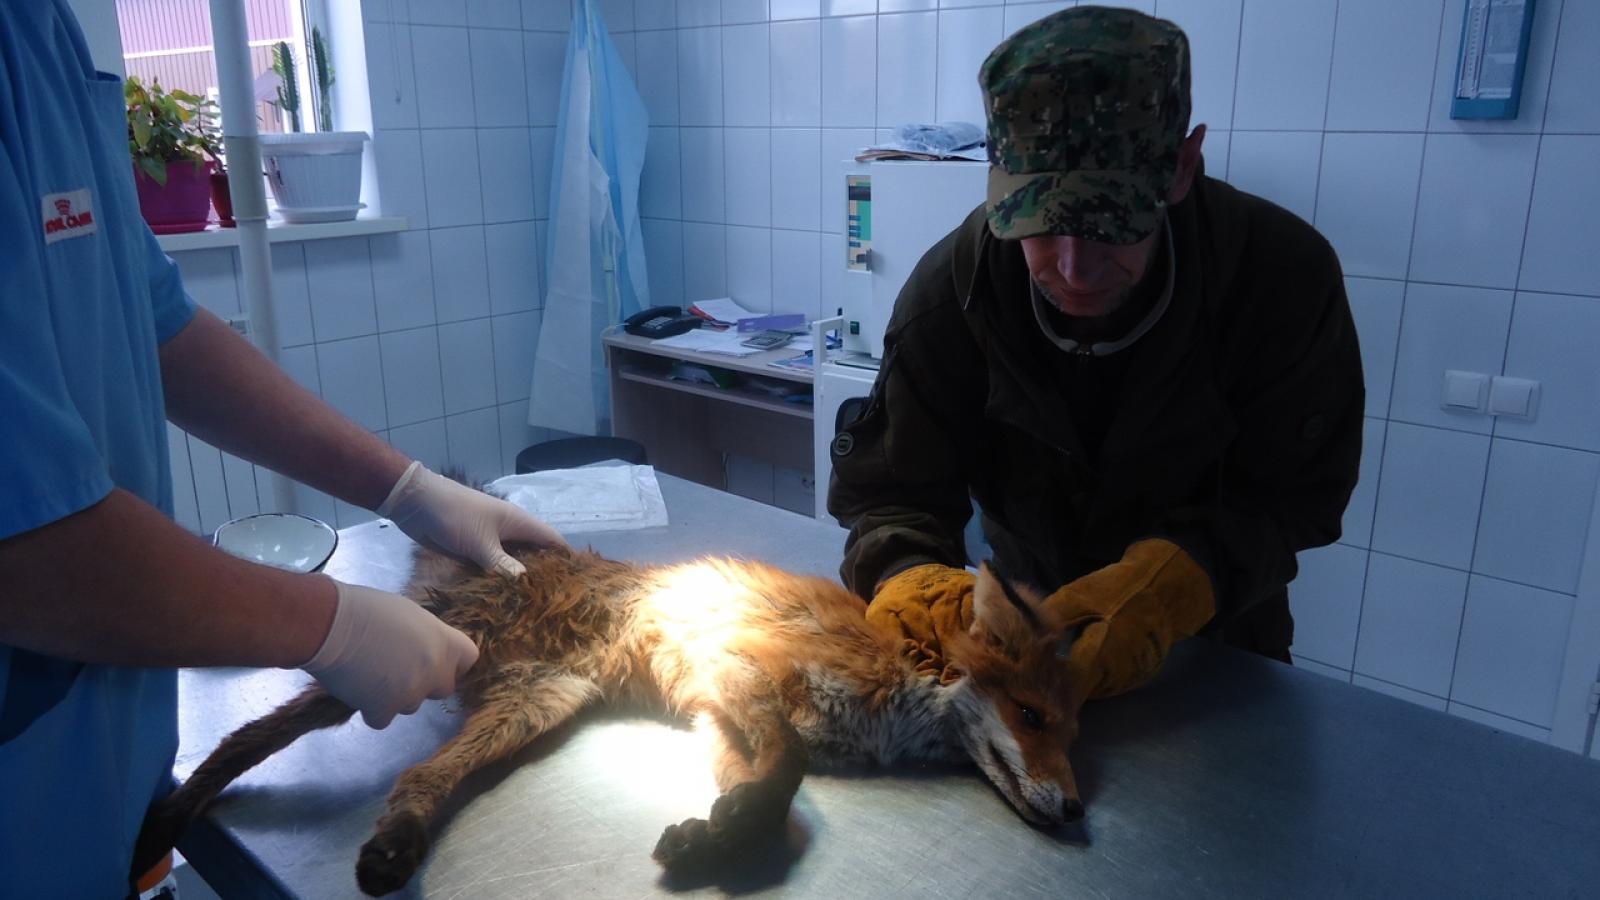 Череповецкий водитель спас сбитую лису